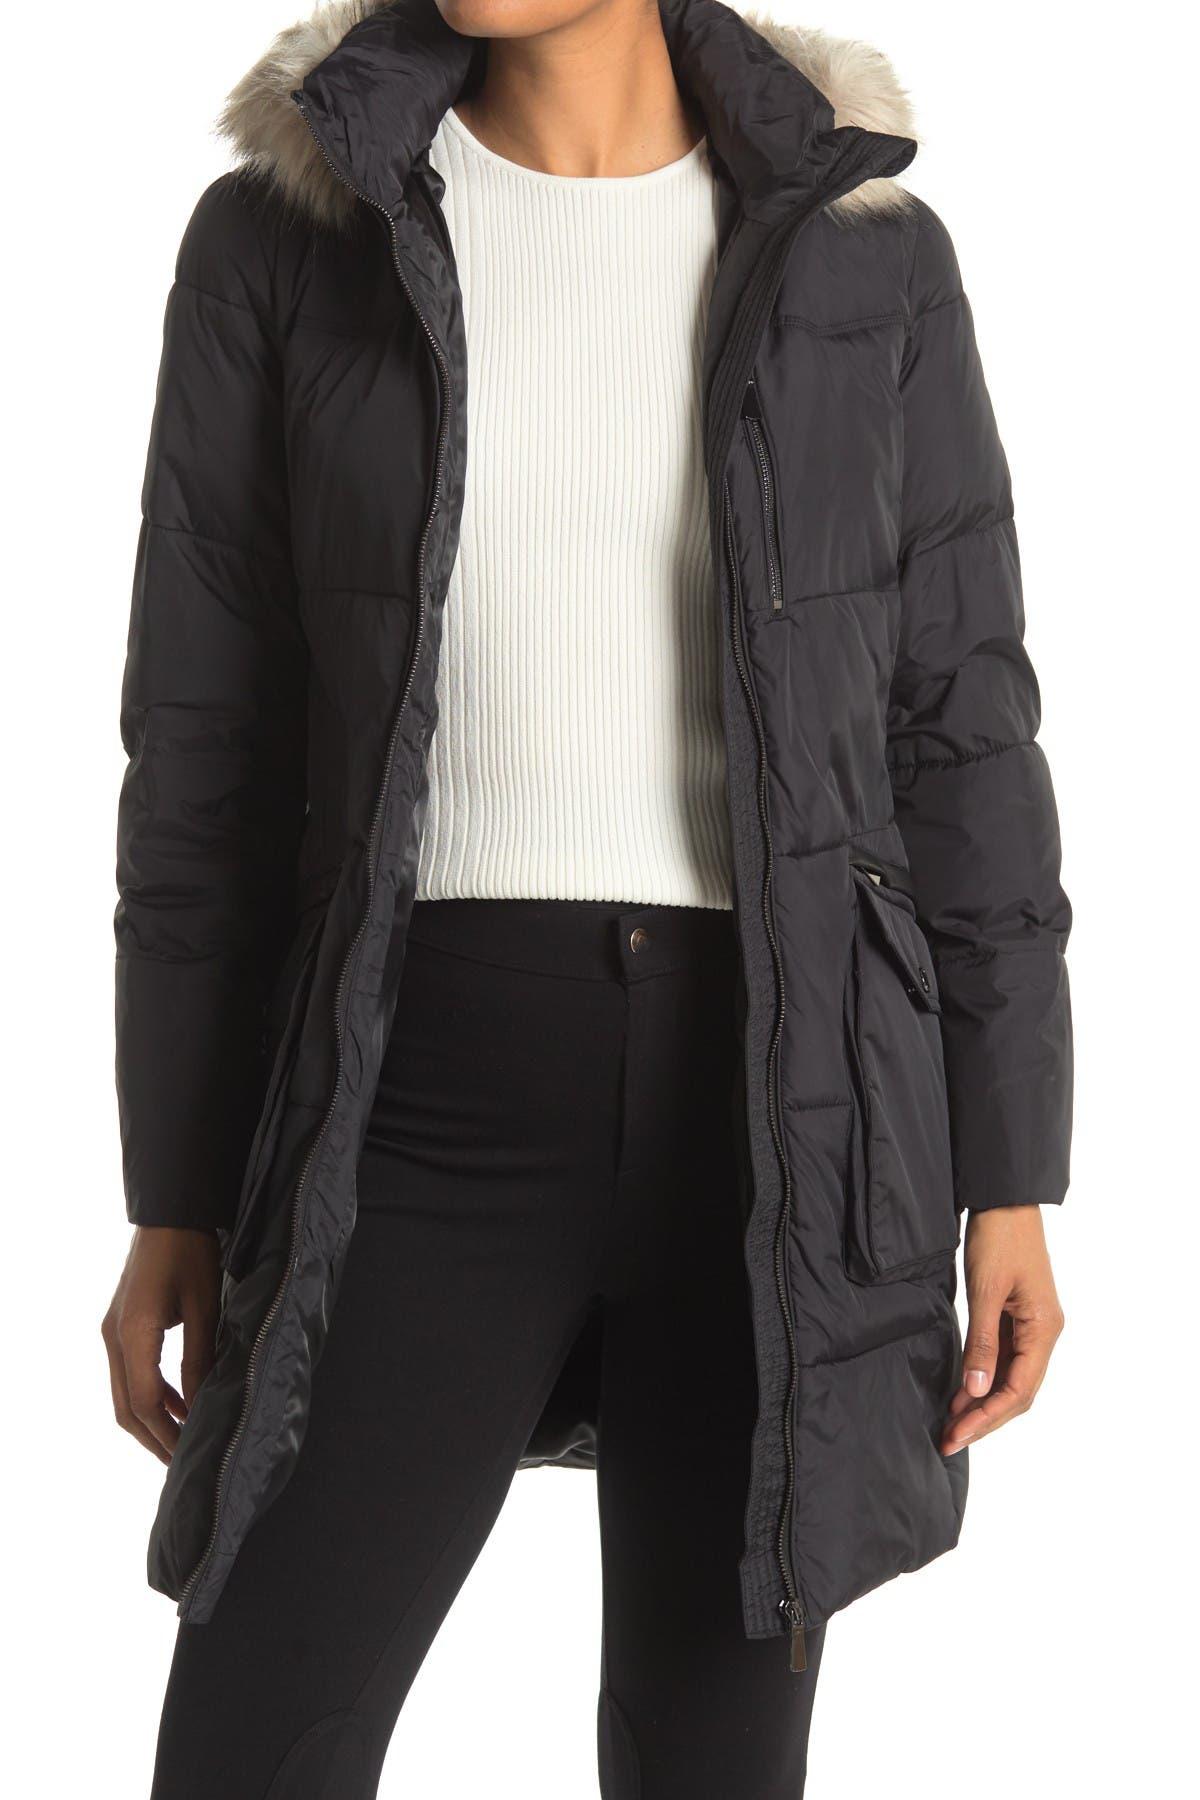 Image of DKNY Faux Fur Trim Down Coat